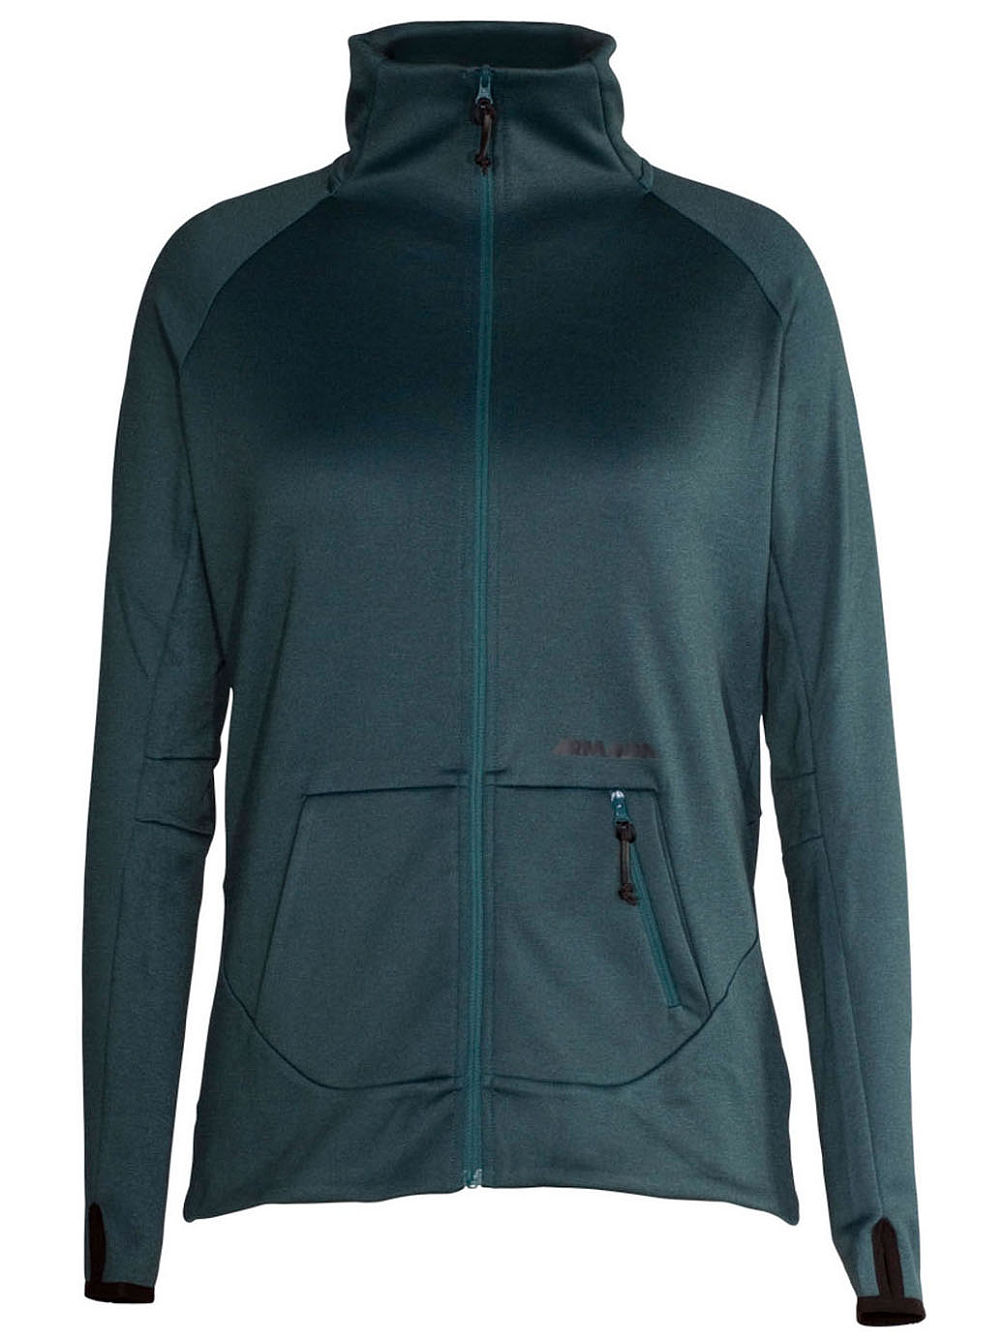 armada-retreat-fleece-jacket